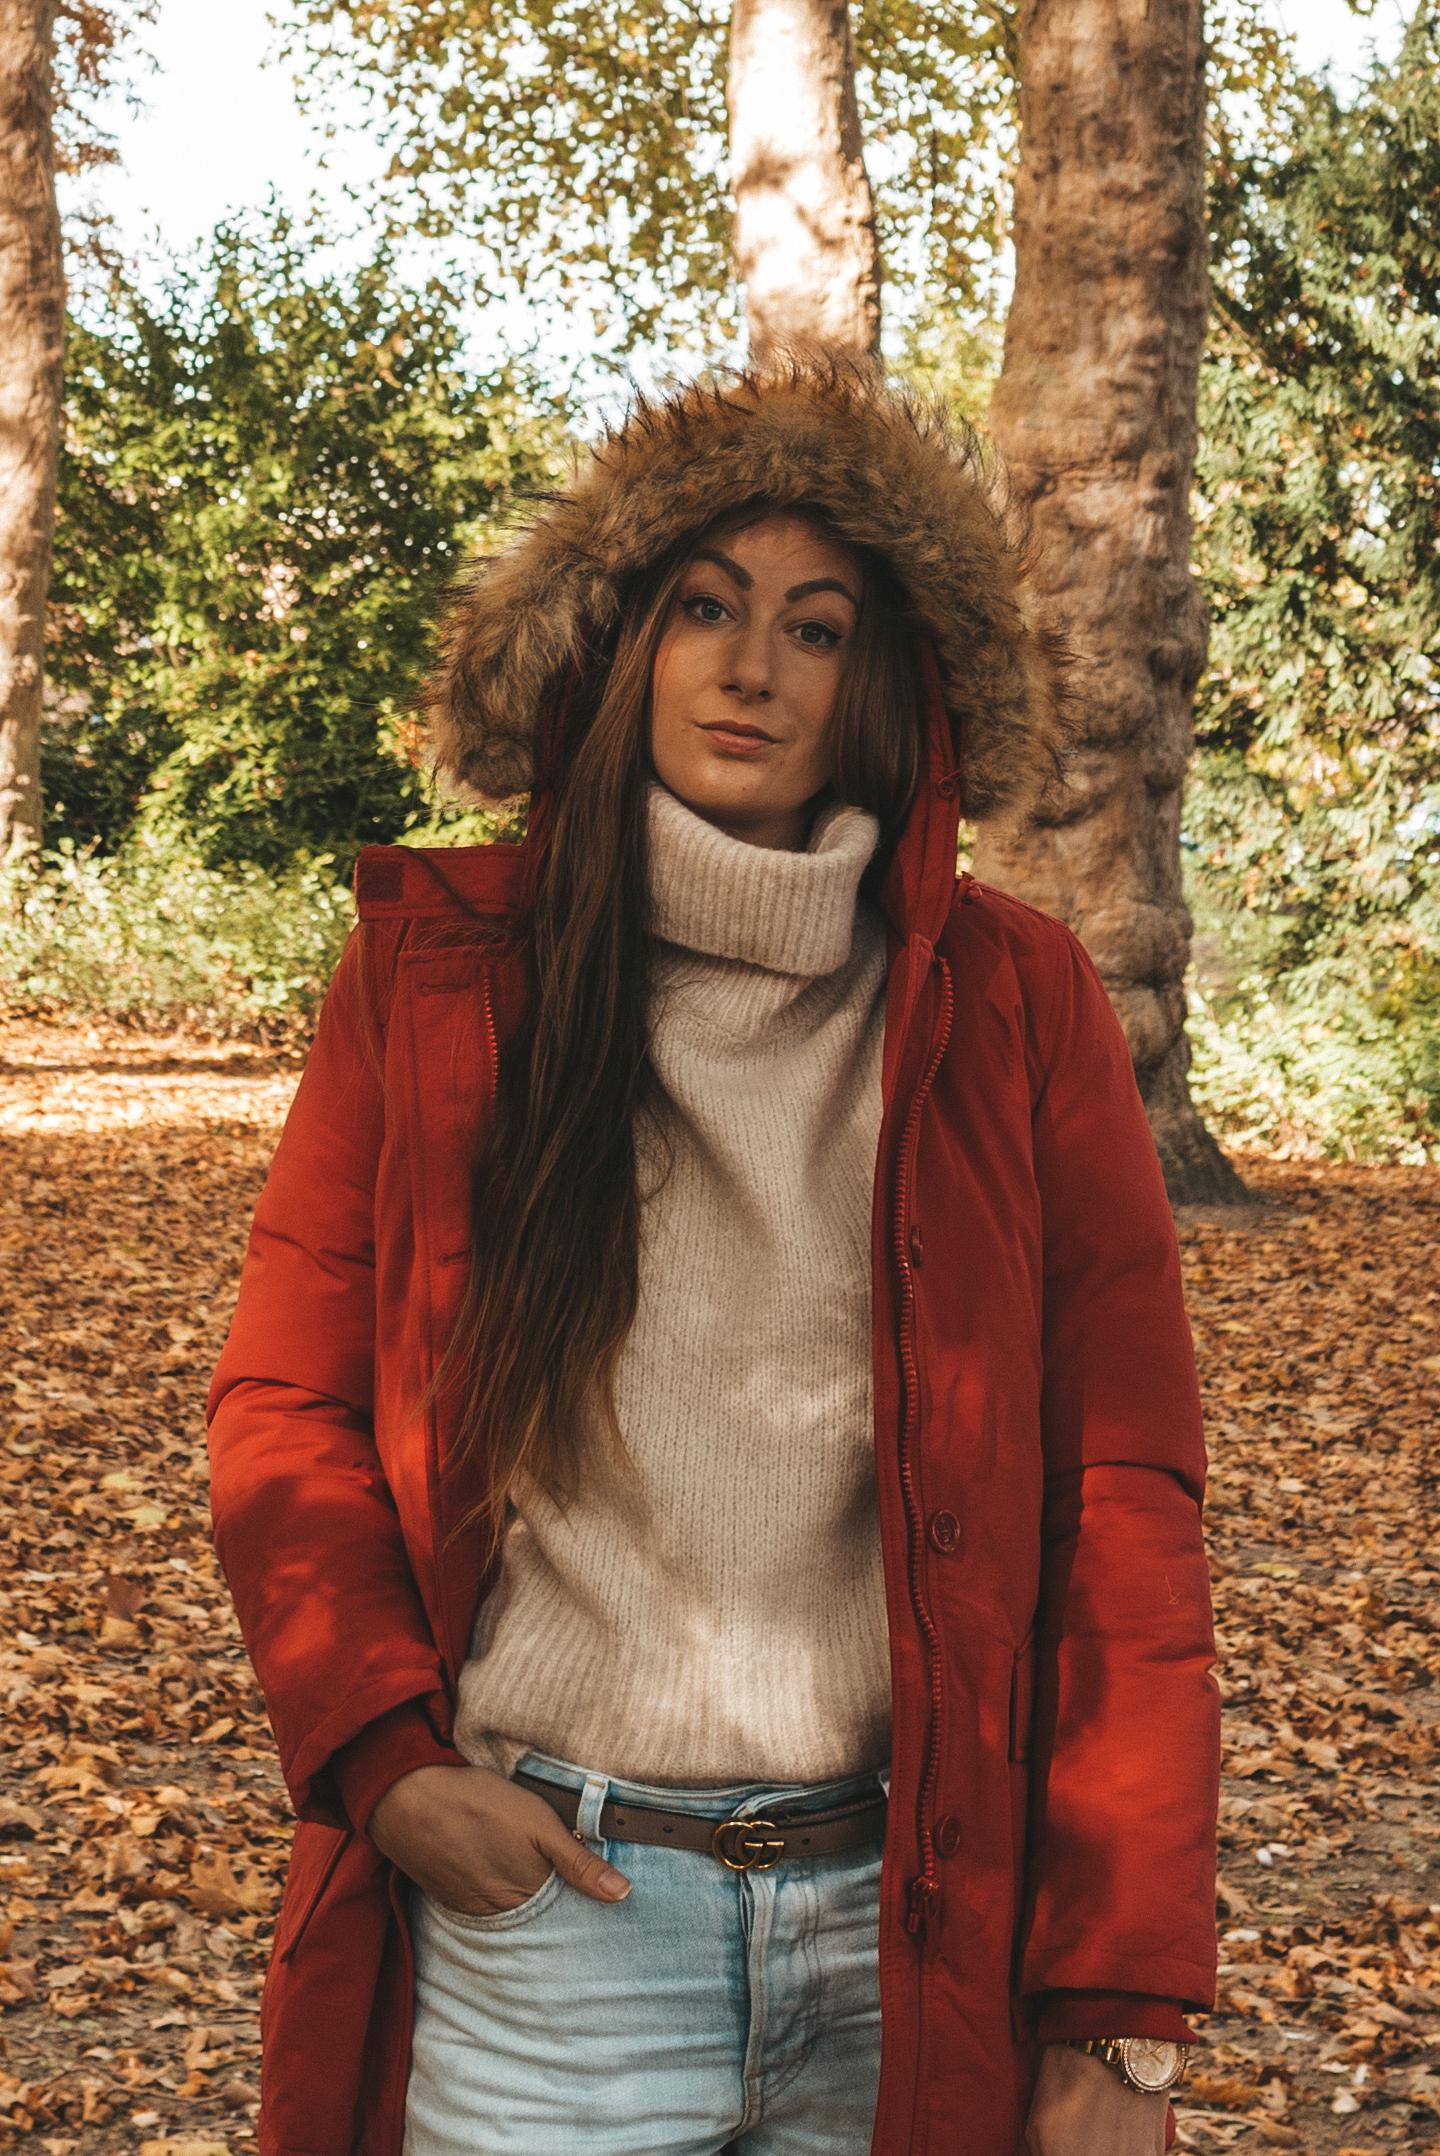 Style Italy winterjas herfst outfit Dubbelsteynpark